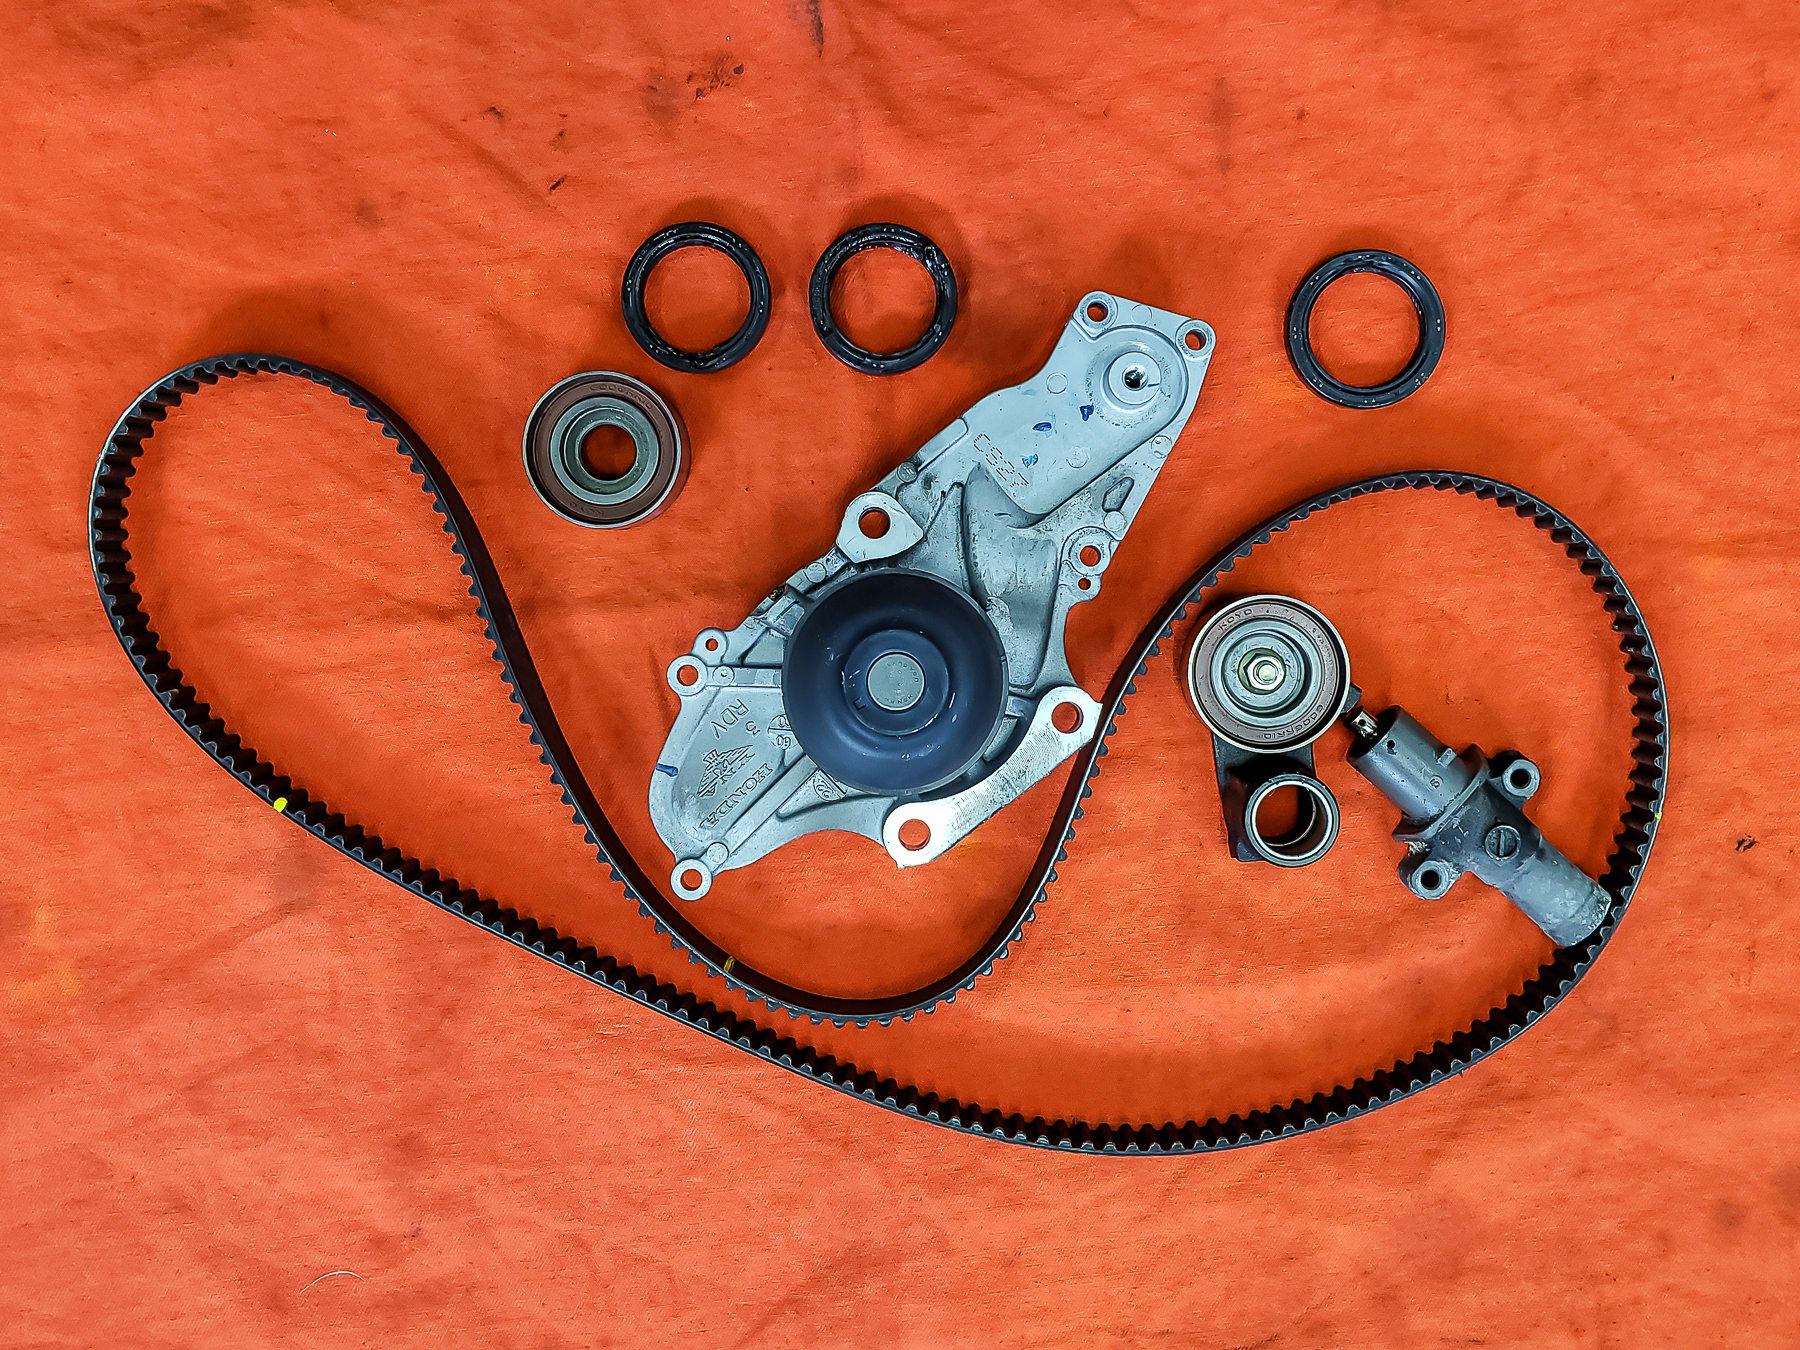 2006 Honda Ridgeline, Timing Belt Replacement